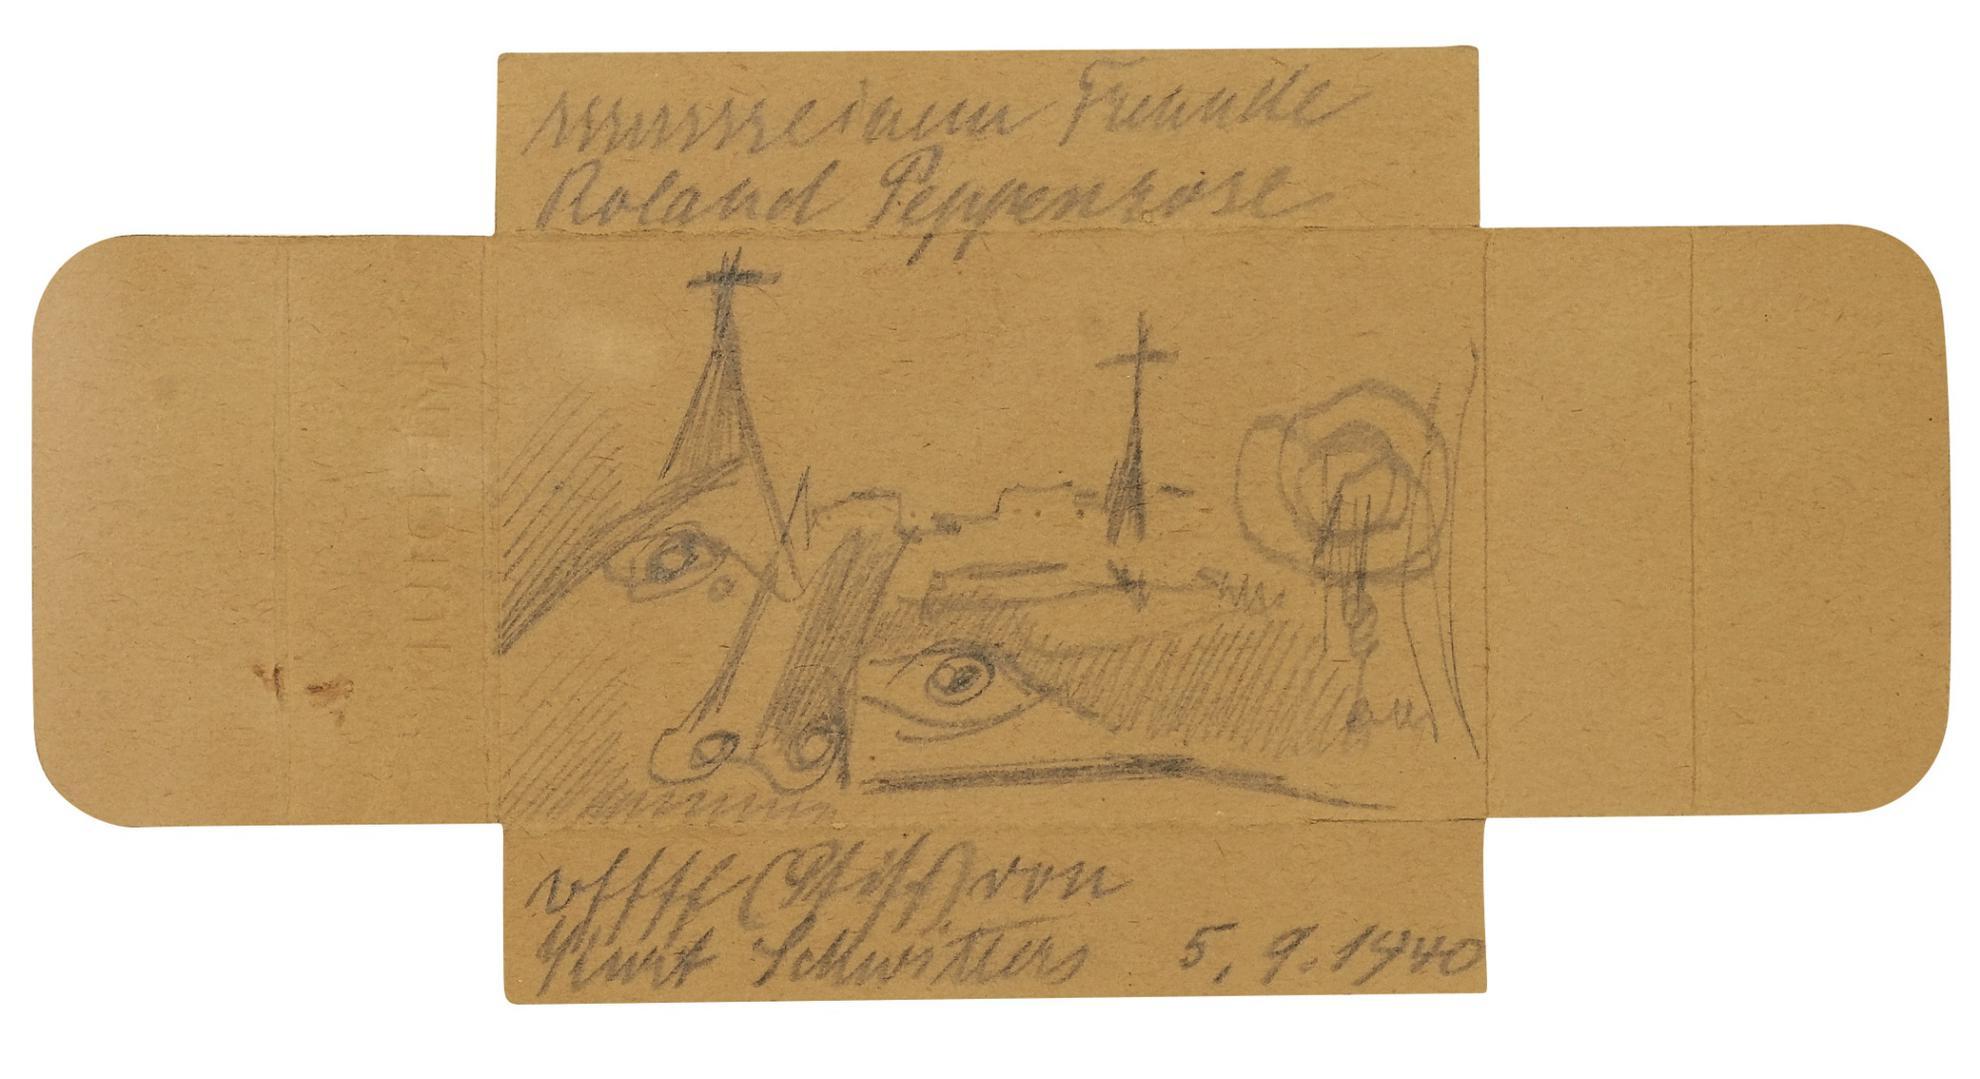 Kurt Schwitters-Sssssssseinem Freunde Roland Peppenrose (Penrose) (Hissssssss Friend Roland Peppenrose (Penrose))-1940